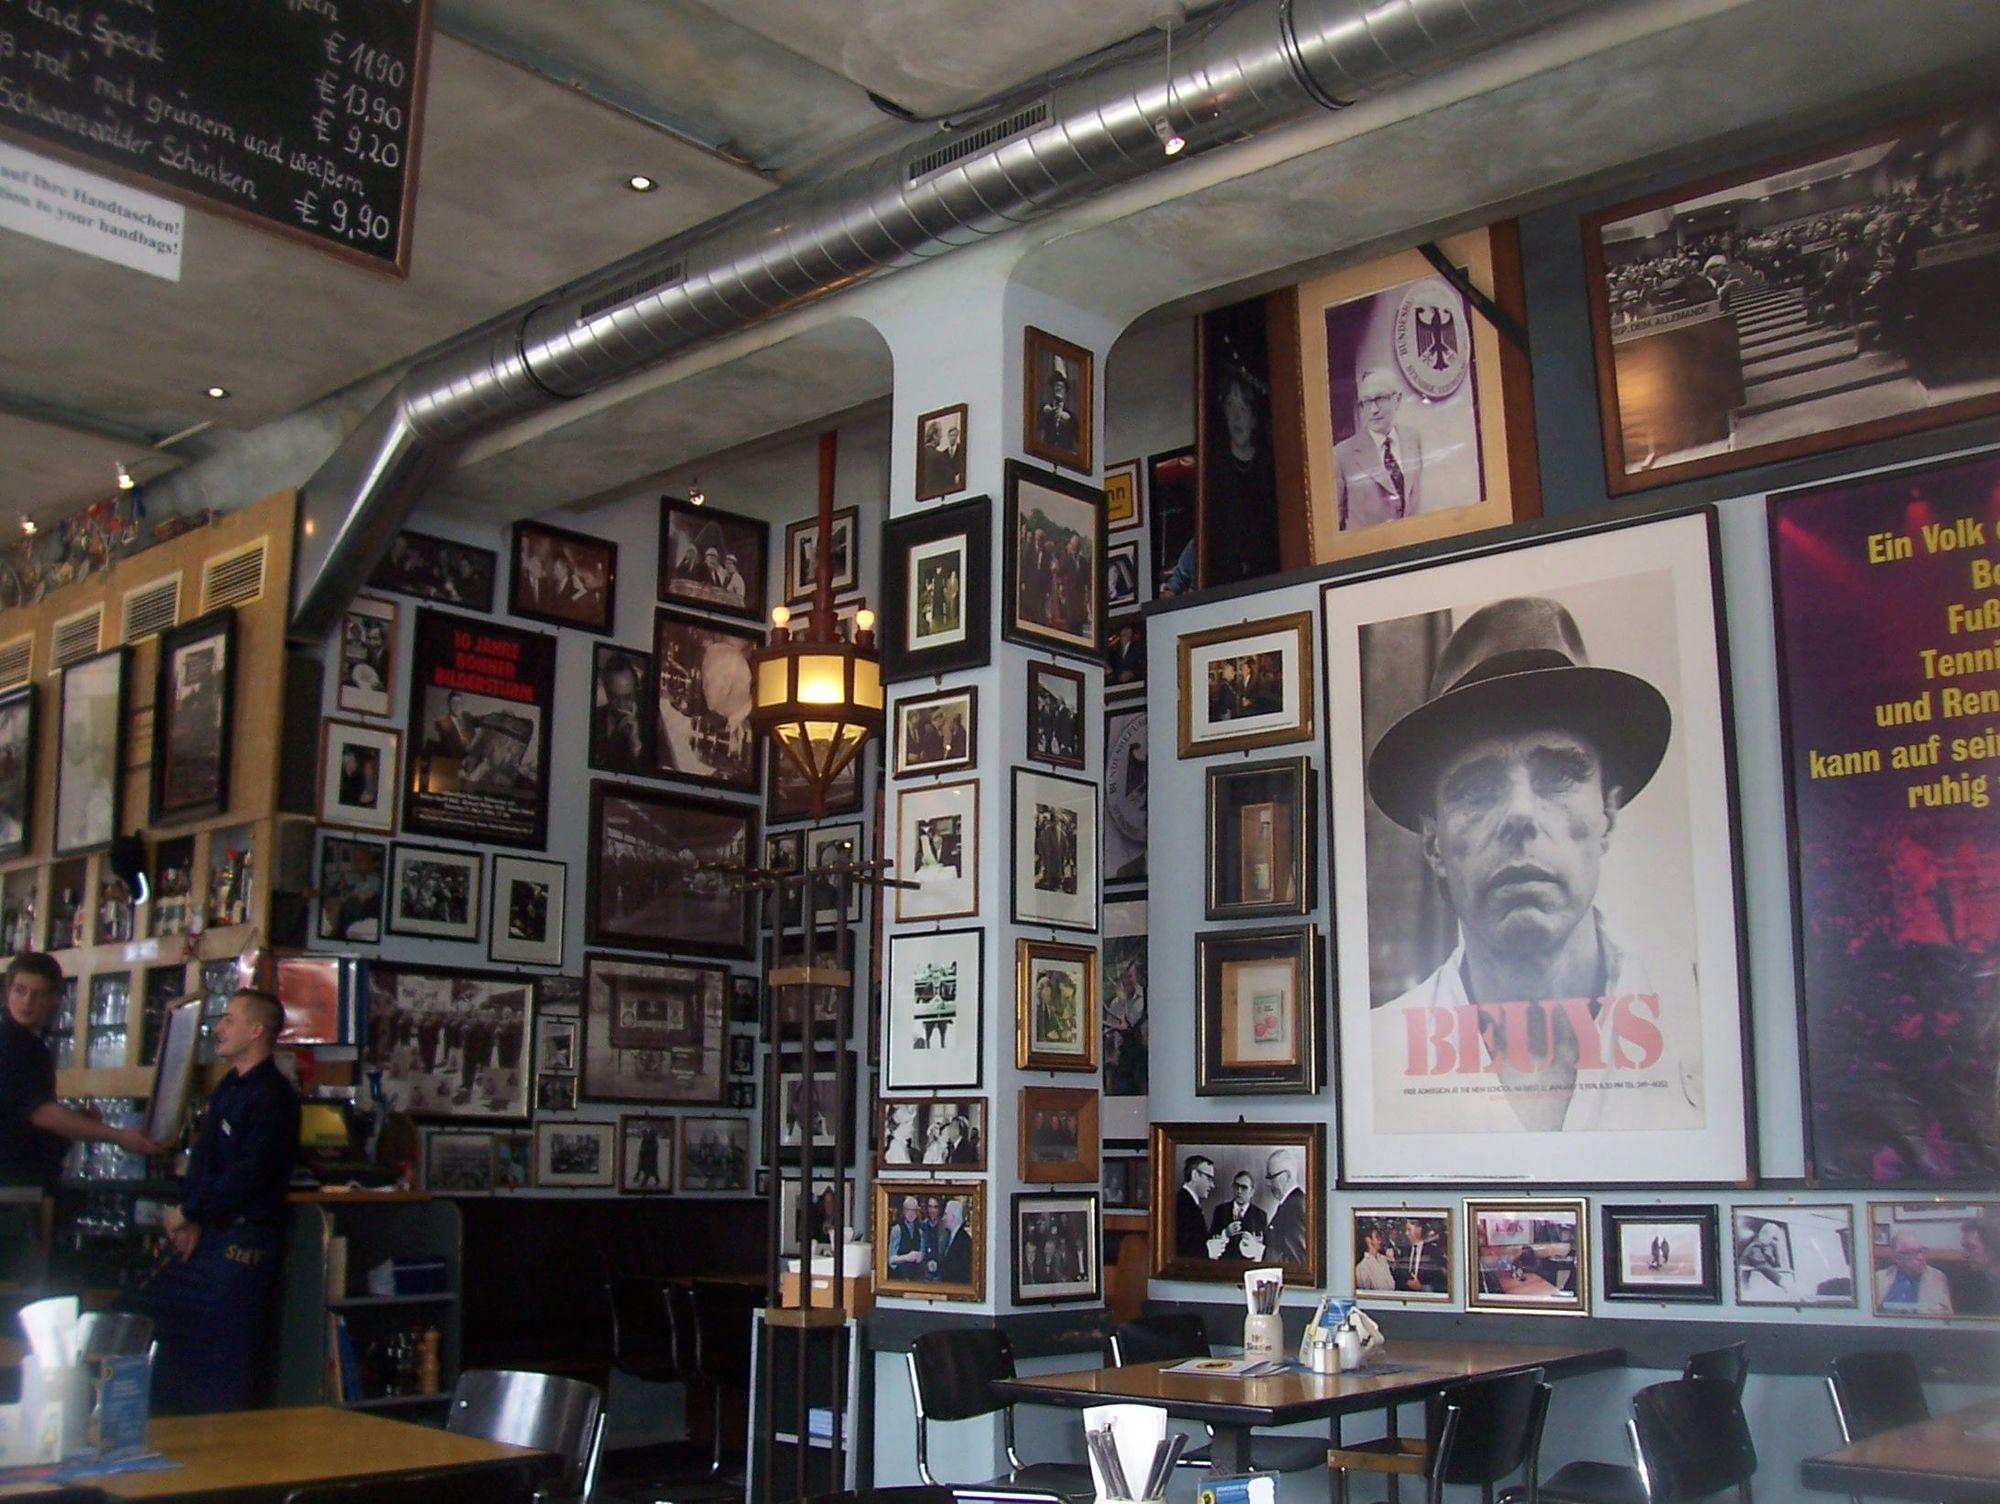 Berlin Cafe In Alter Apotheke